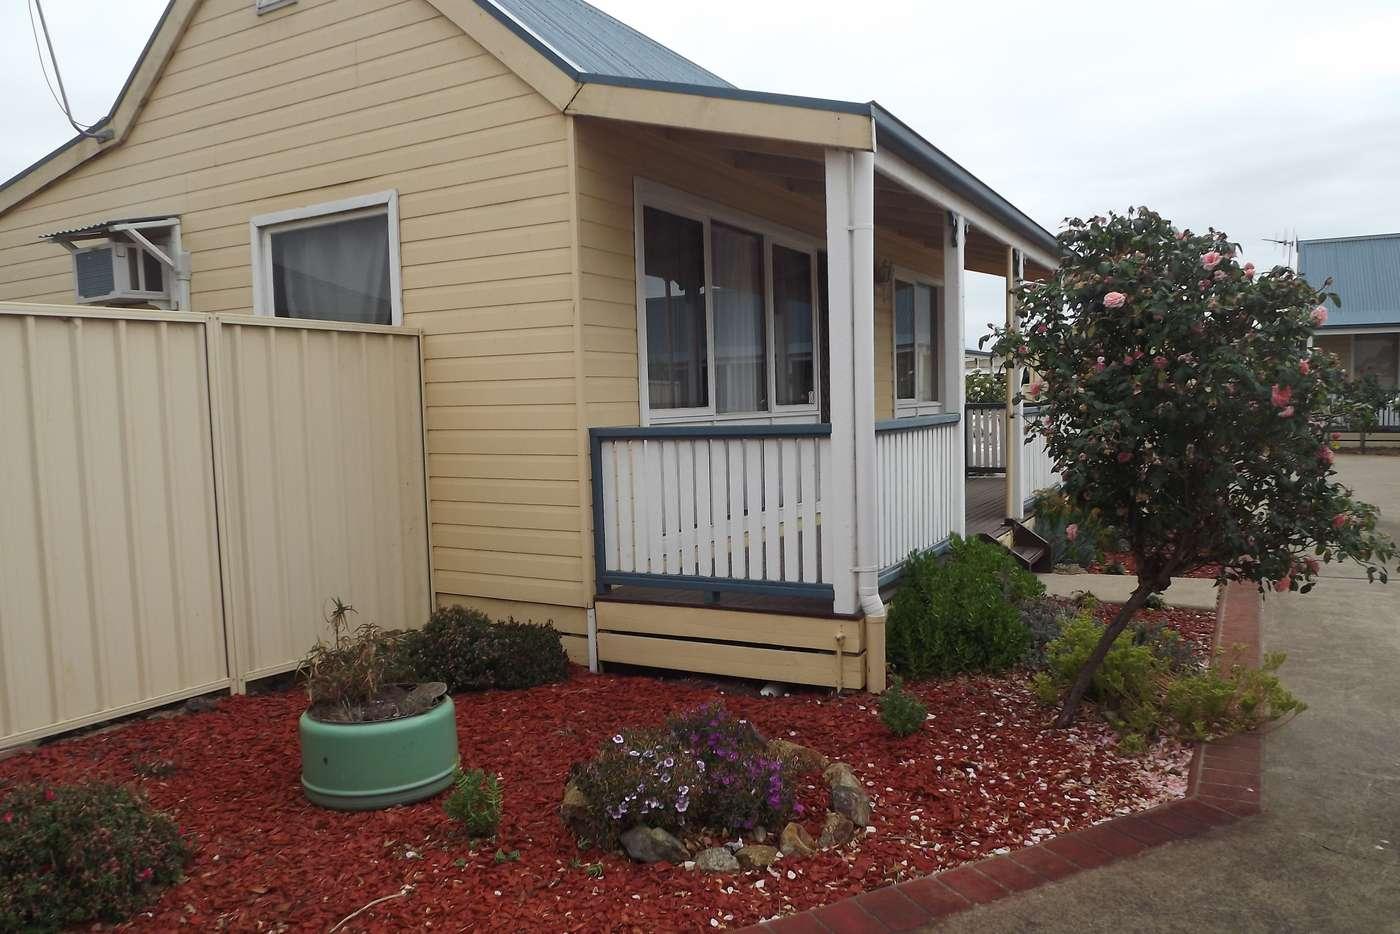 Main view of Homely unit listing, 5/16 Telford Street, Yarrawonga VIC 3730